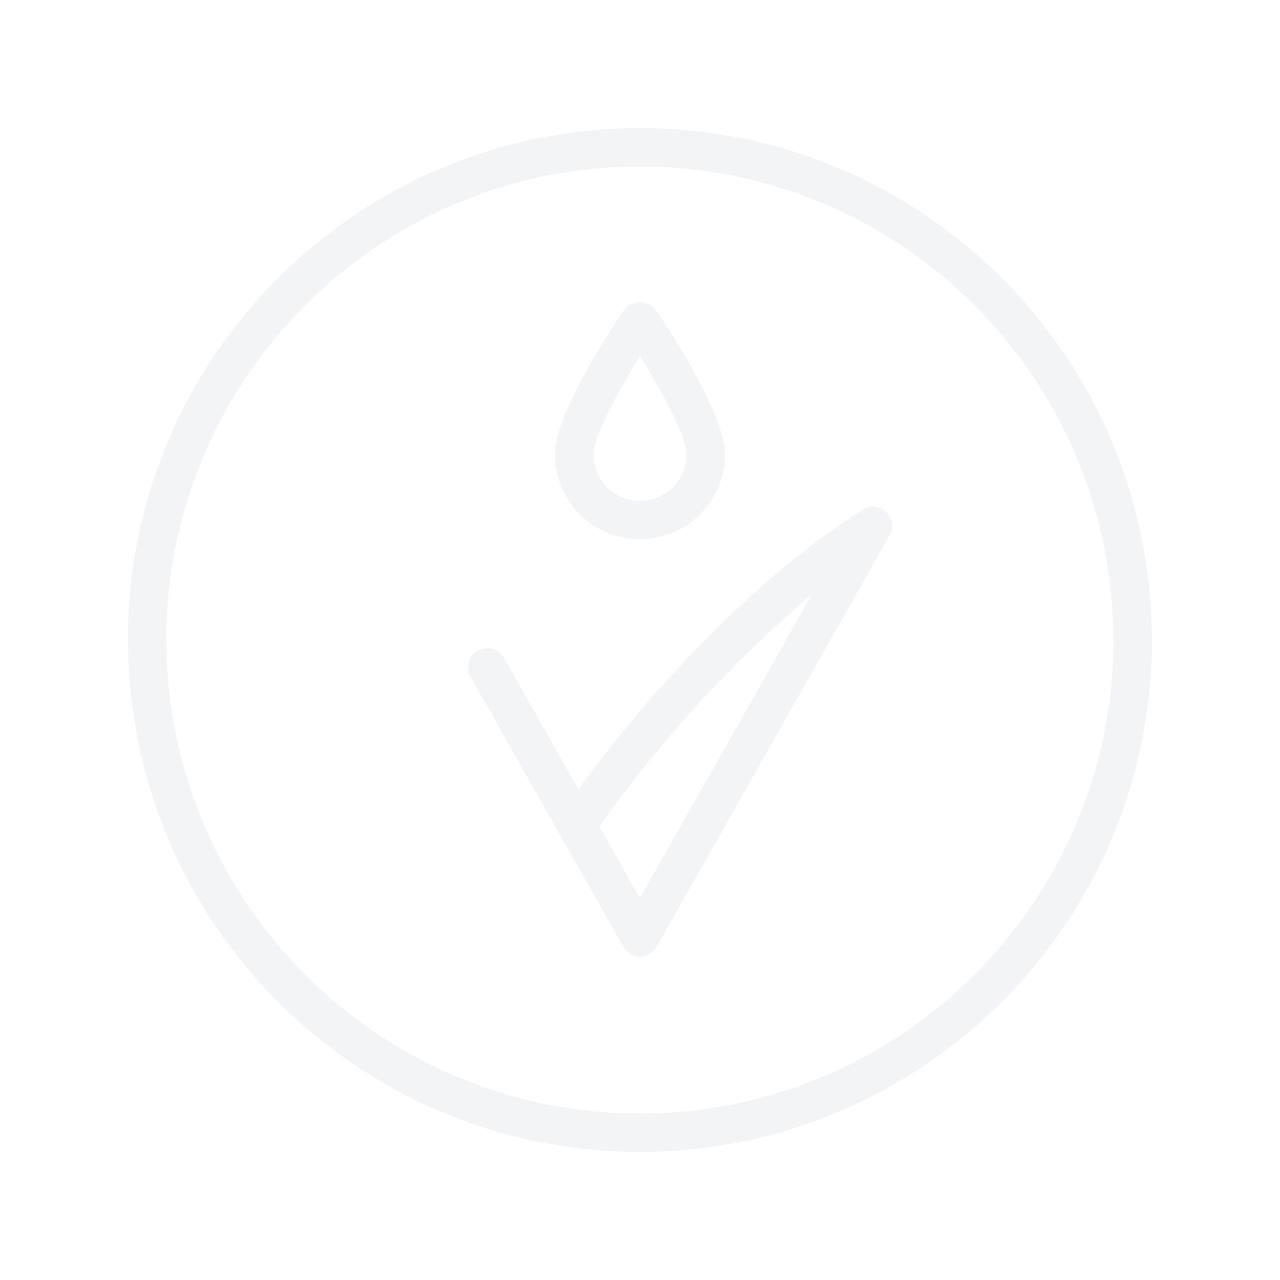 IDUN Minerals Eyebrow Pencil Lönn 1.2g